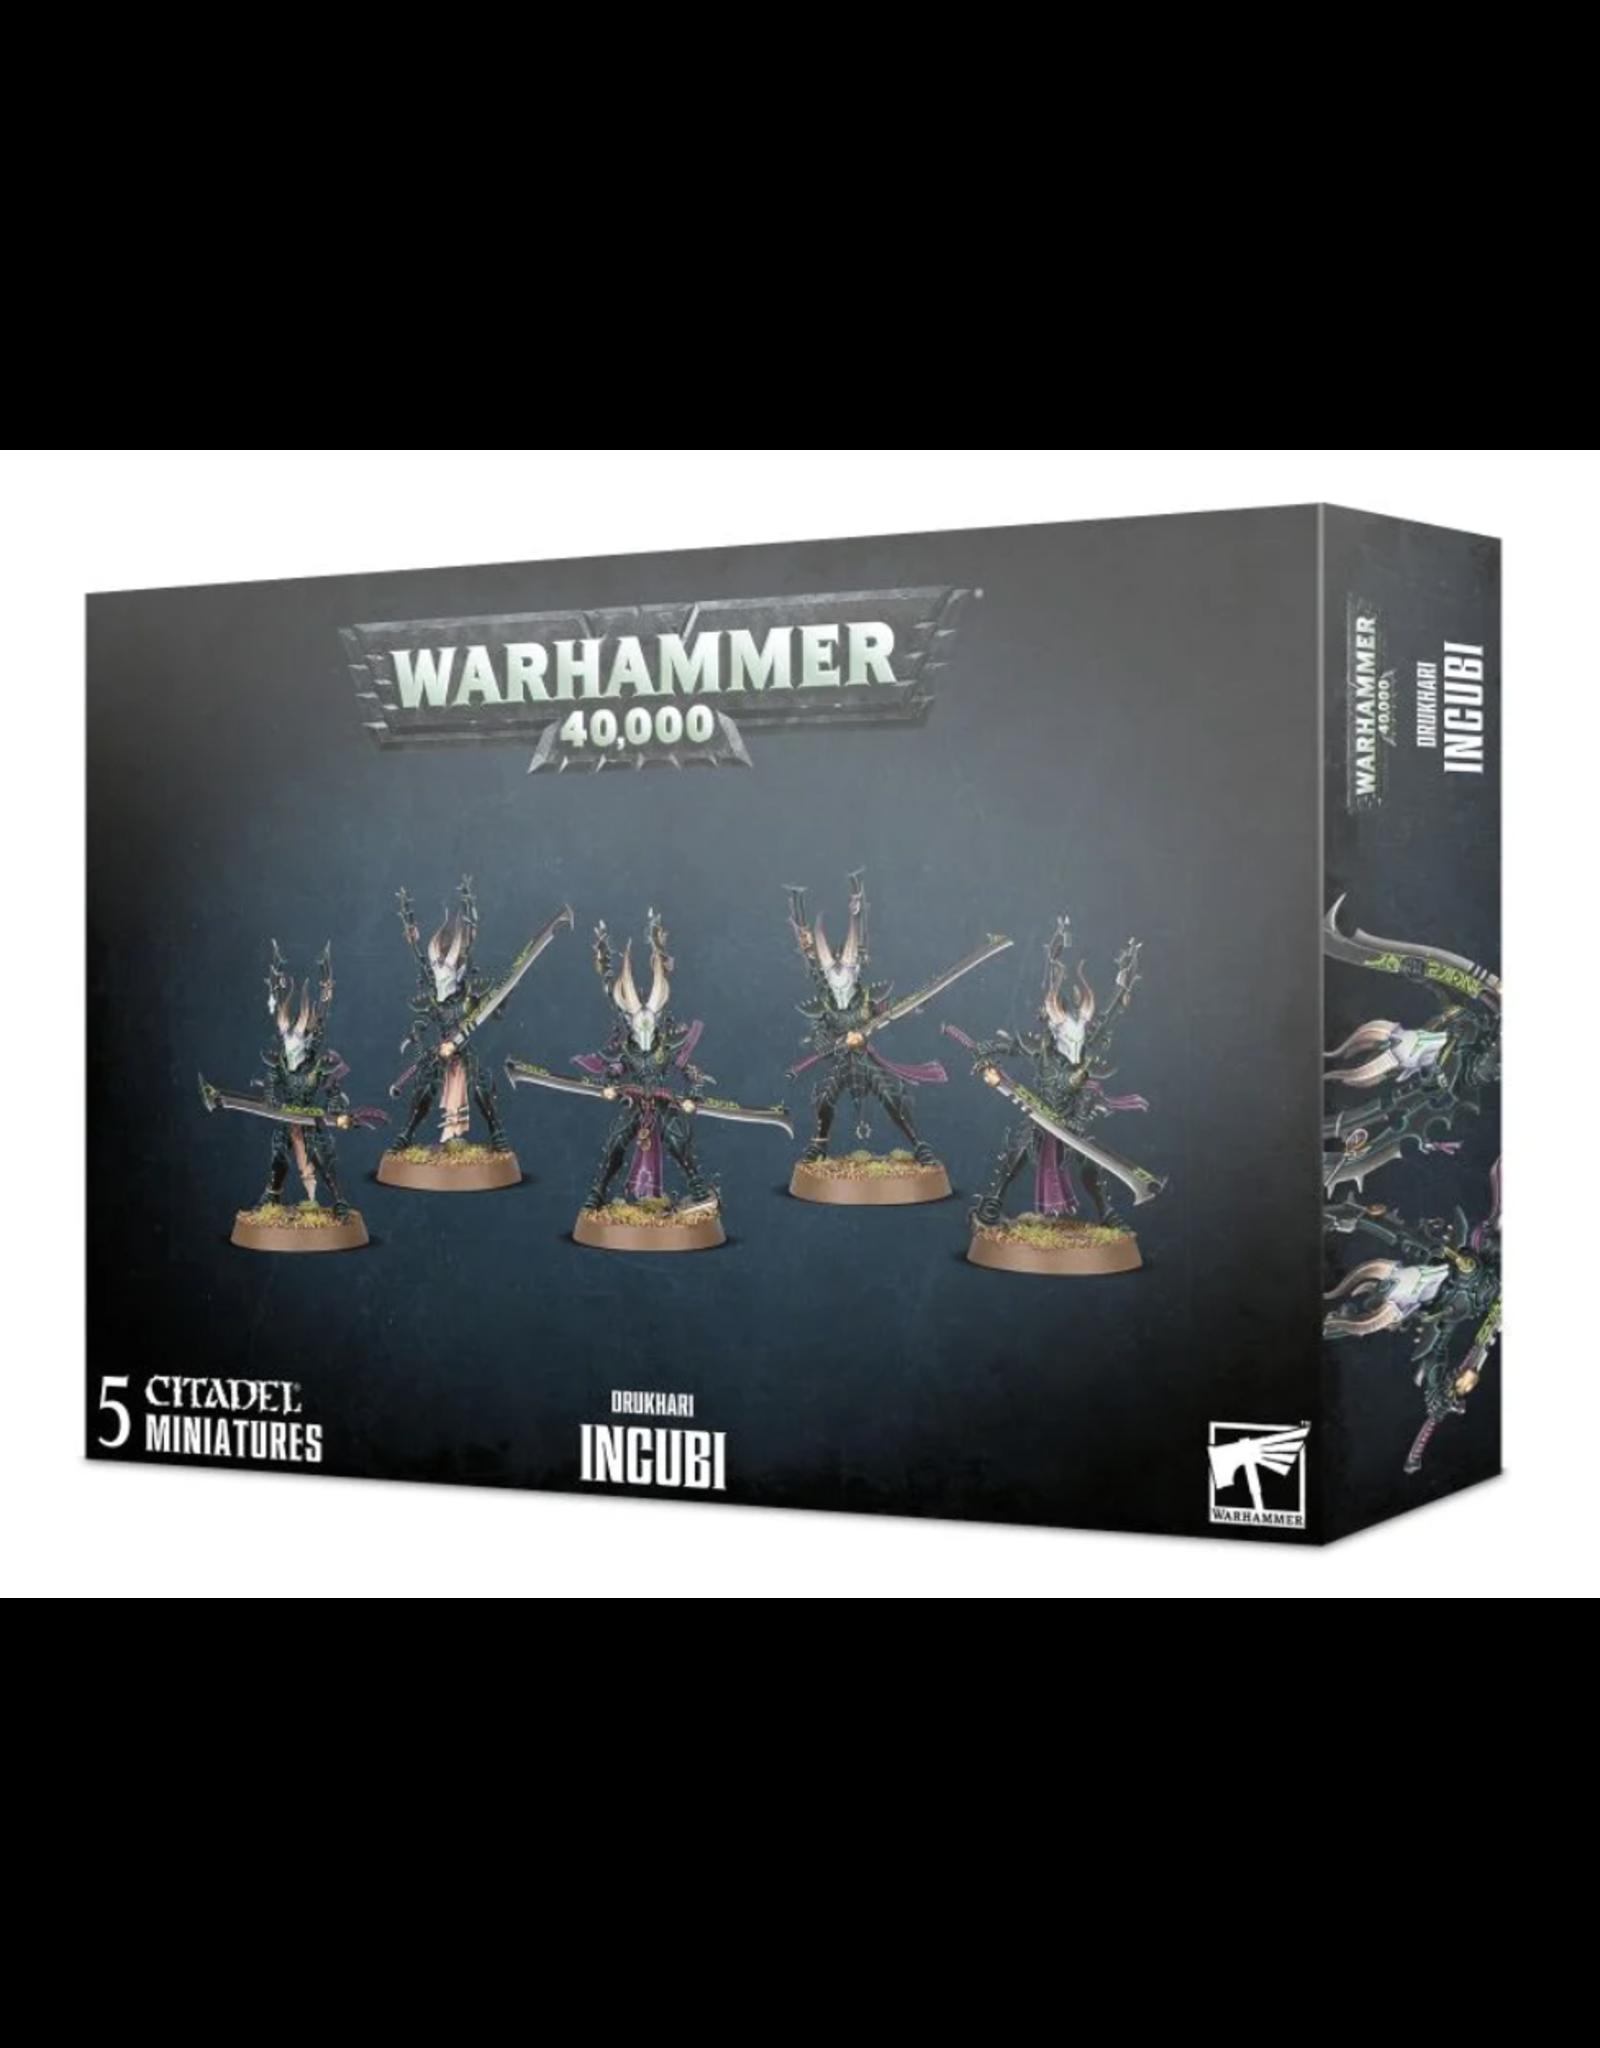 Warhammer 40K Drukhari Incubi